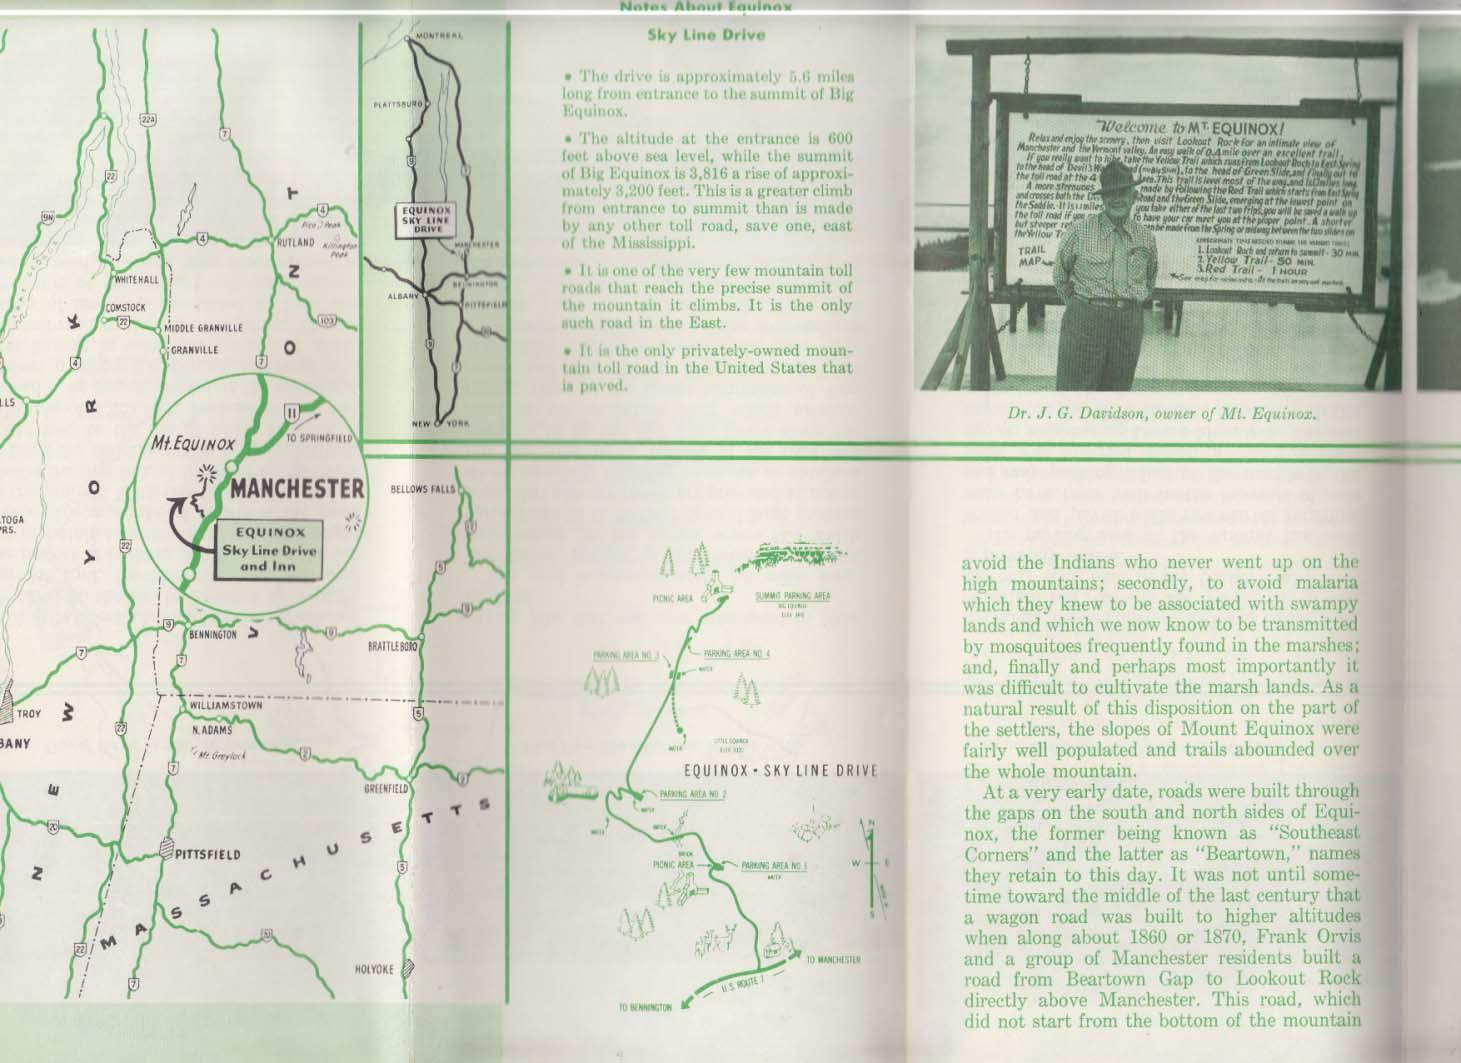 Equinox Sky Line Drive & Sky Line Inn brochure 1950s Manchester VT